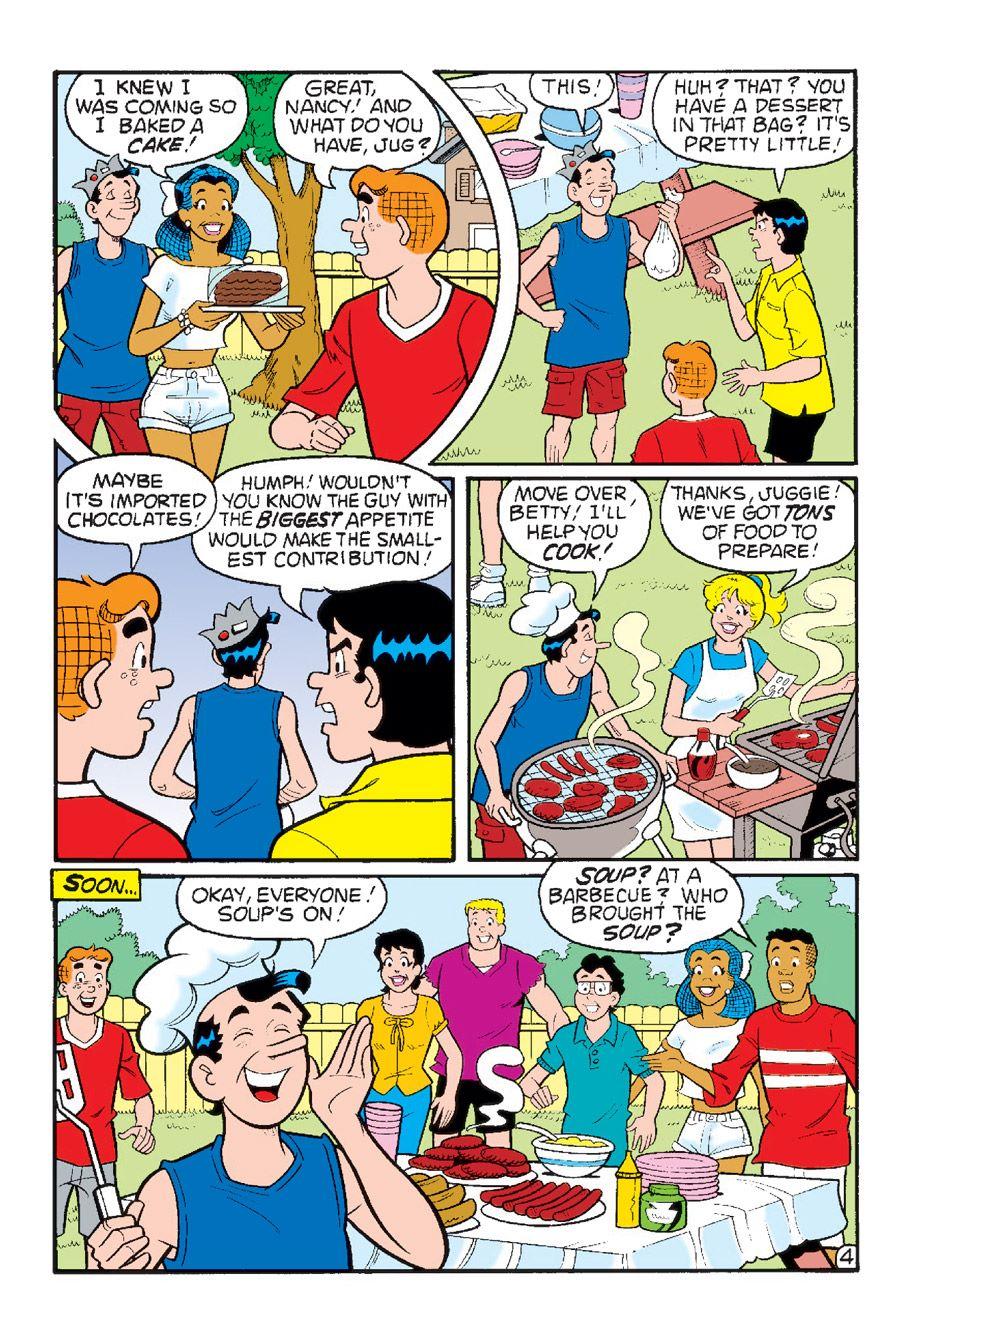 WorldOfArchieJumboComicsDigest_110-8 ComicList Previews: WORLD OF ARCHIE JUMBO COMICS DIGEST #110